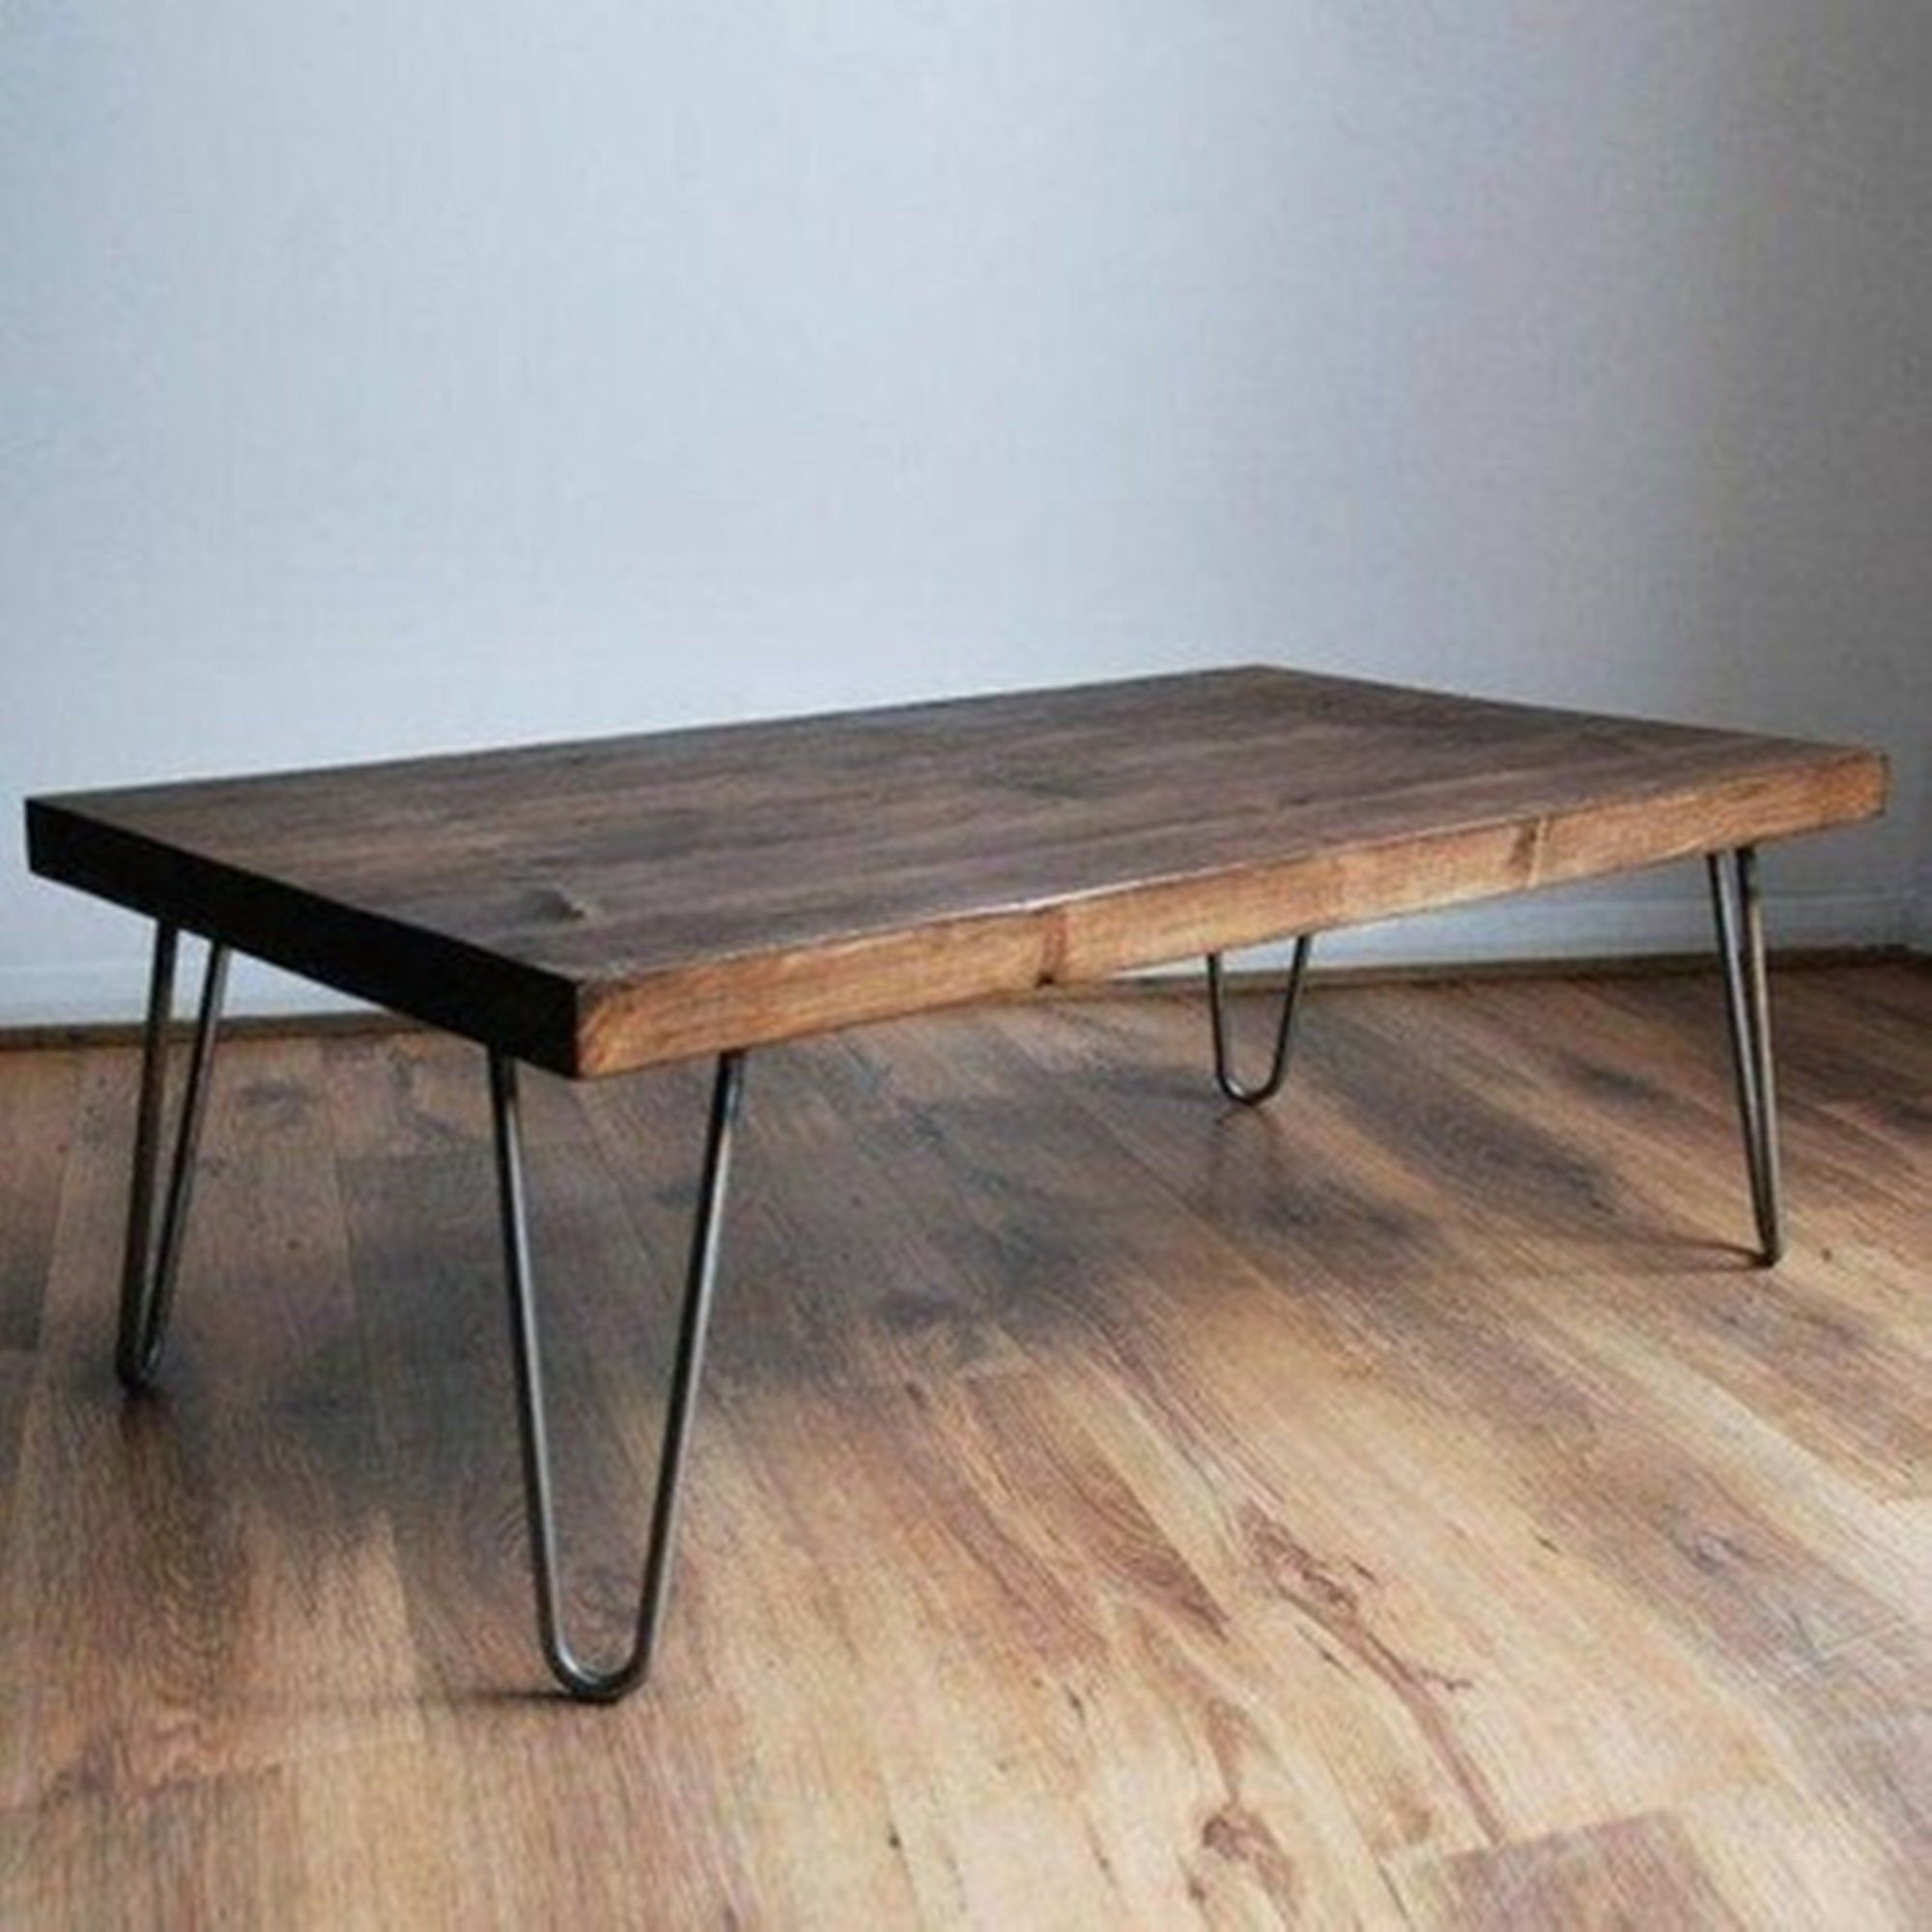 Rustic Wooden Coffee Tableblack Walnut Tablesofa Table Live Etsy In 2020 Rustic Wooden Coffee Table Solid Wood Coffee Table Coffee Table Wood